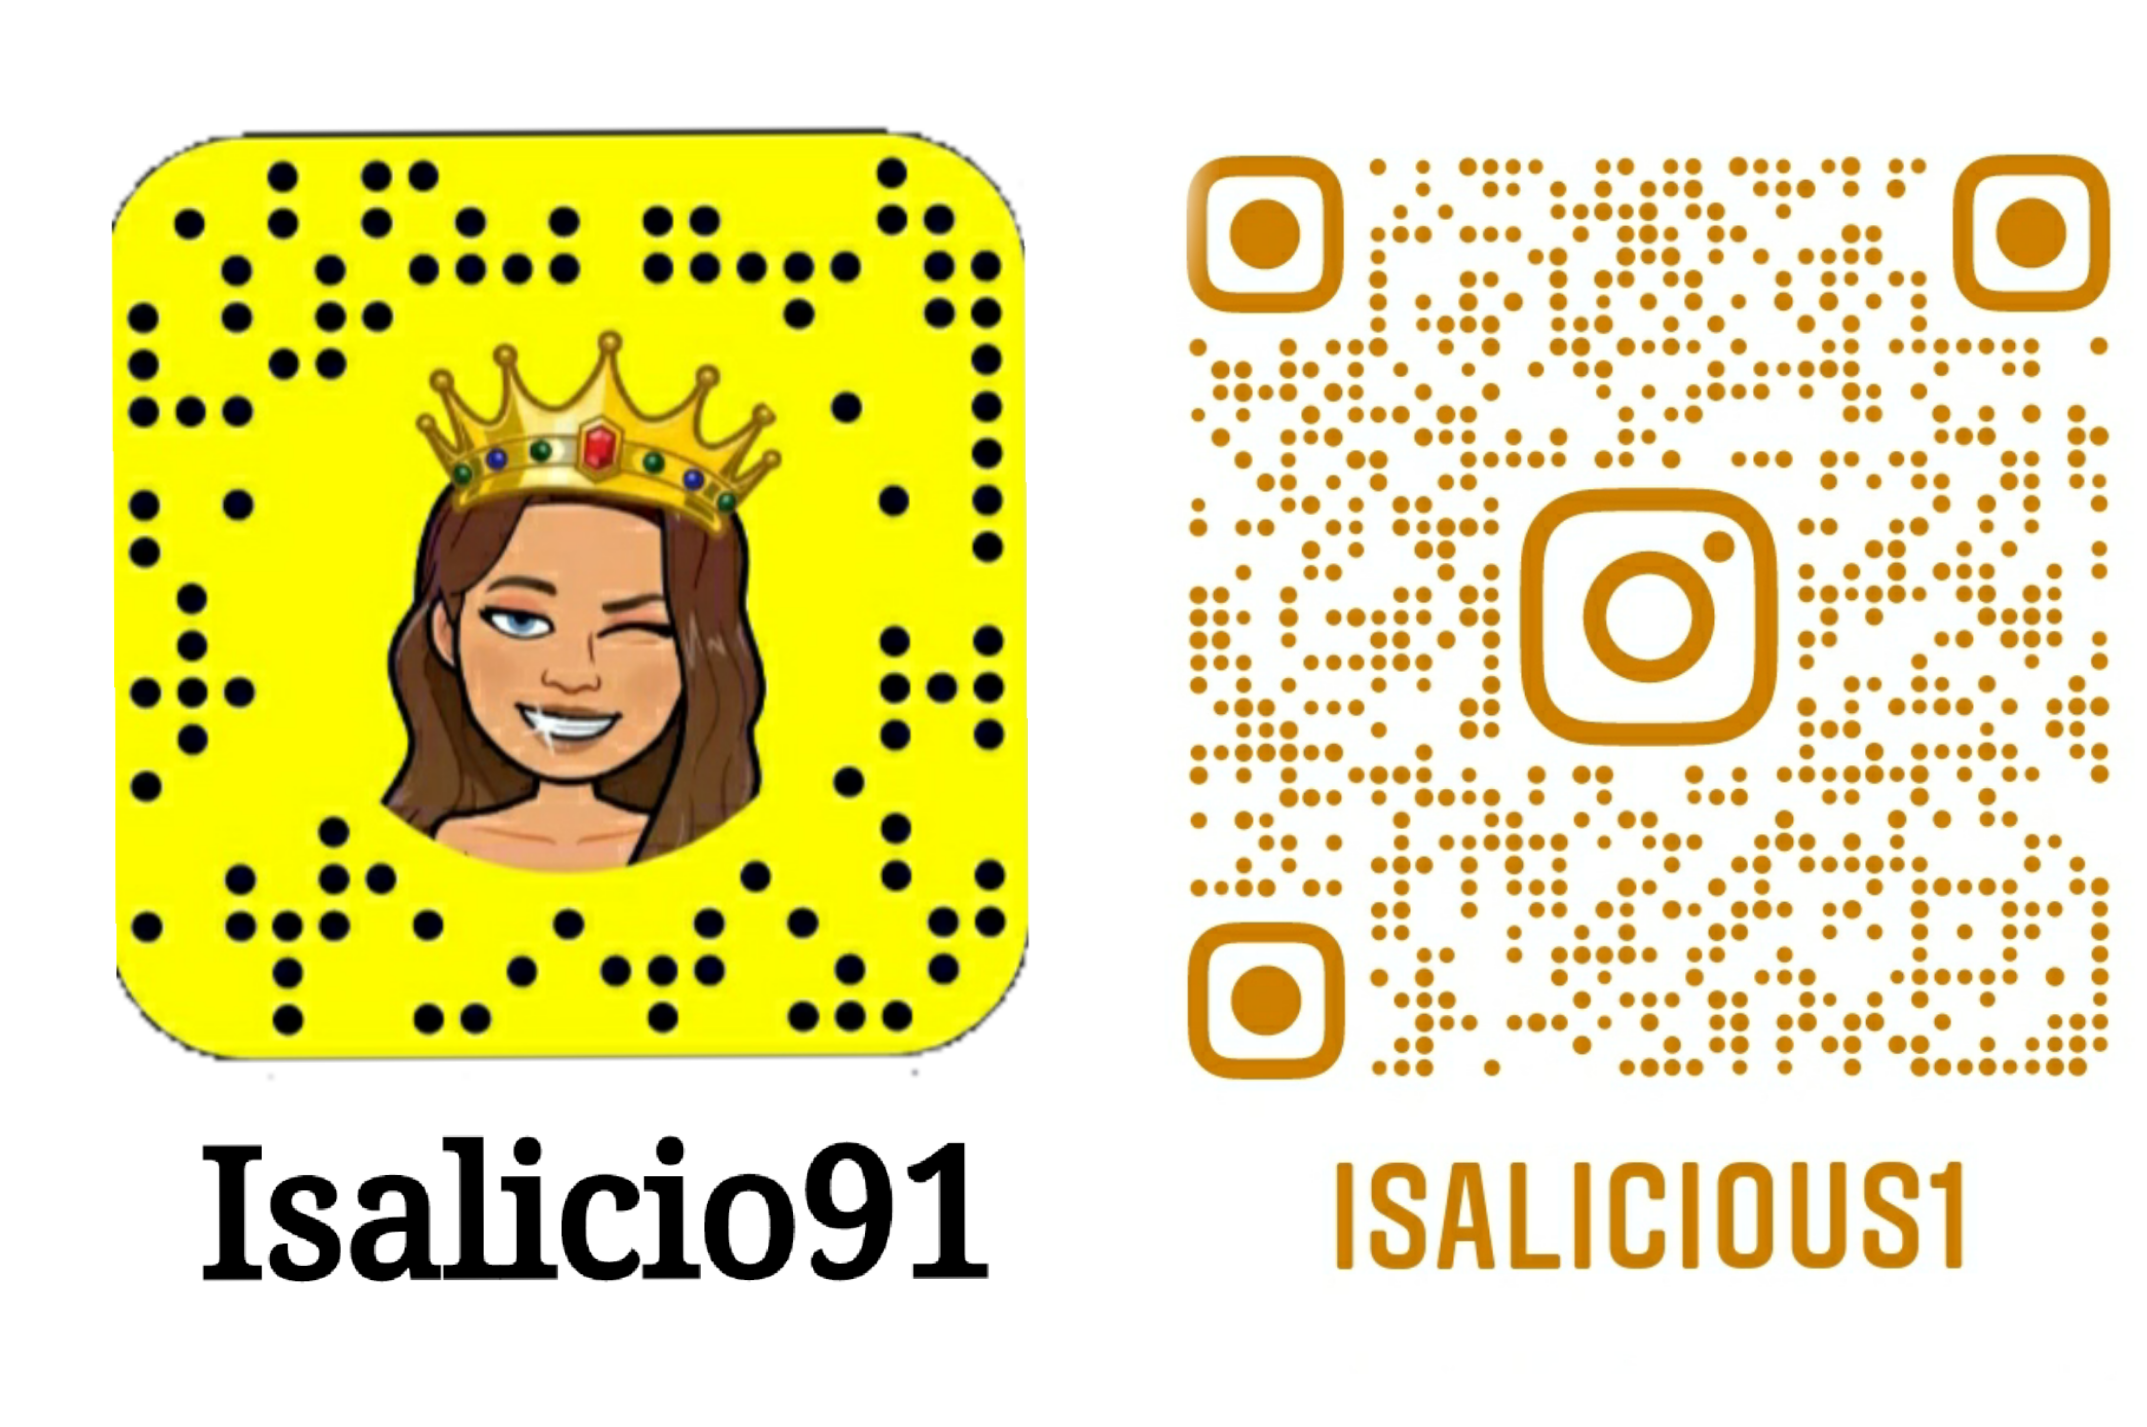 snapcode-isalicious-isalicious.blogg.no-isalicious1-isalicio91-snapchat-instagram-addme